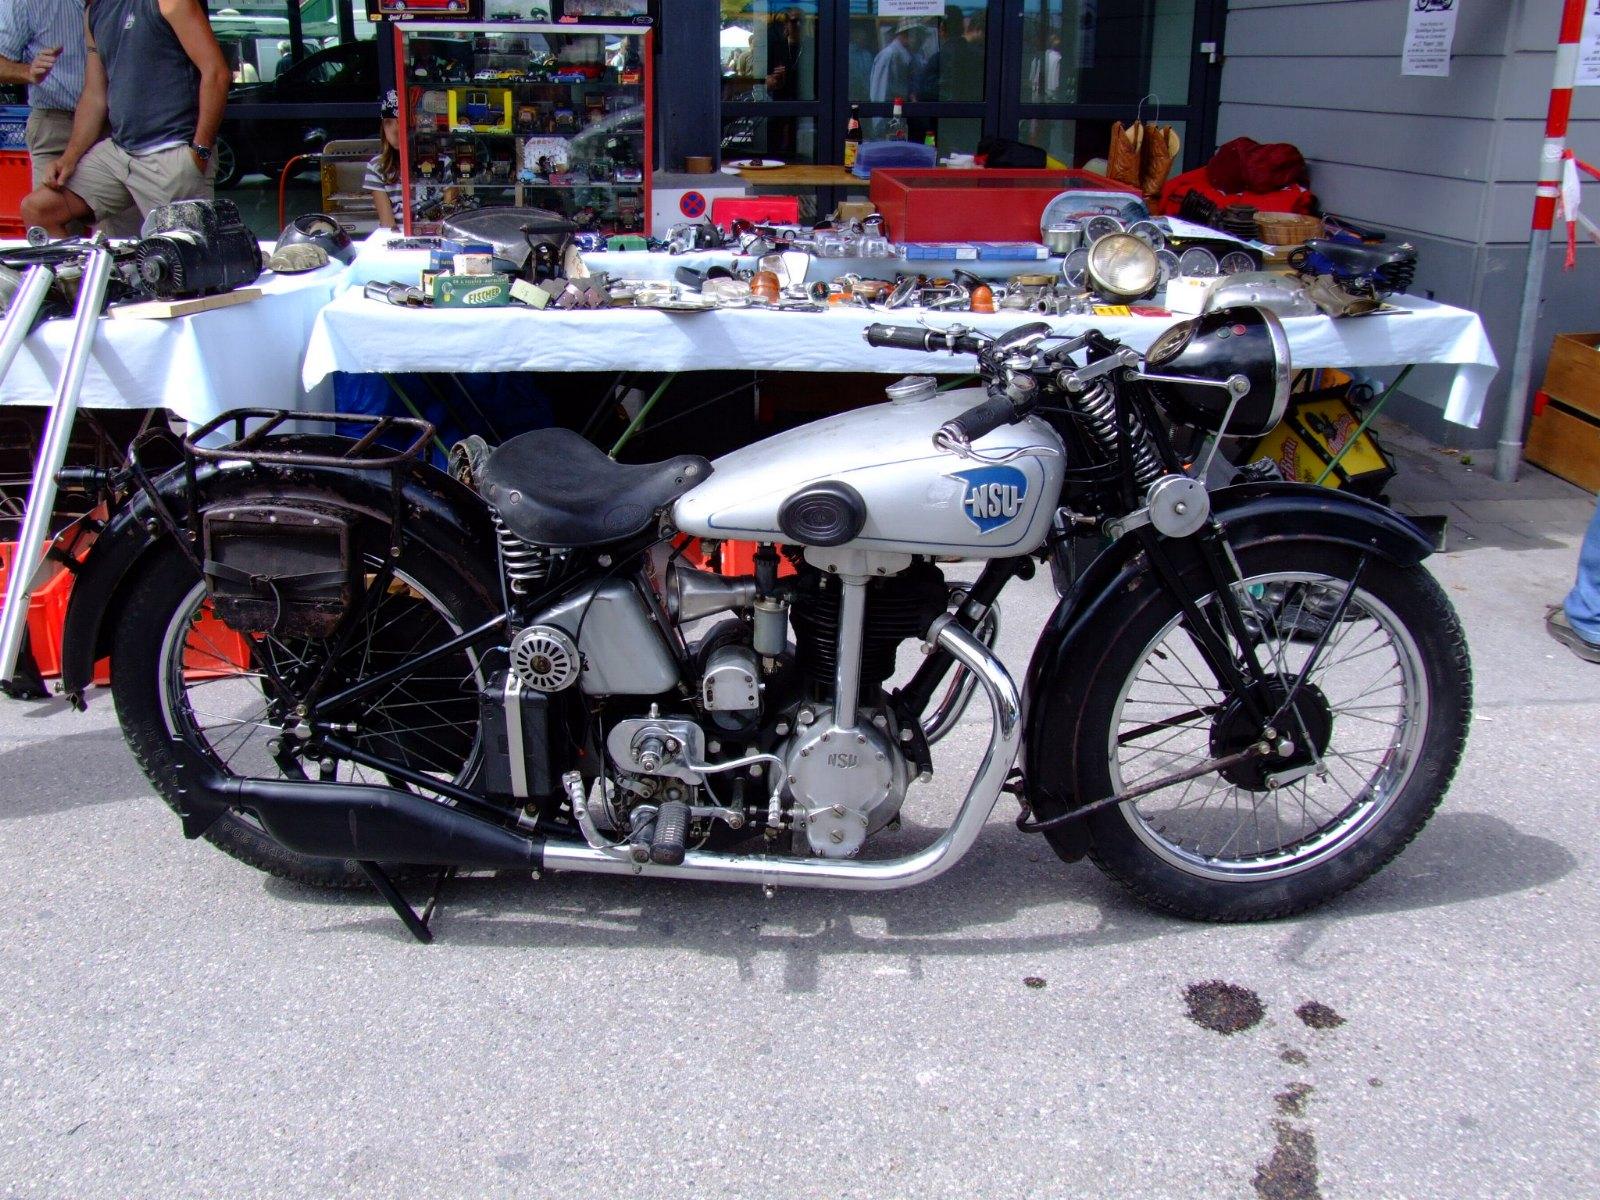 nsu motorsykkel